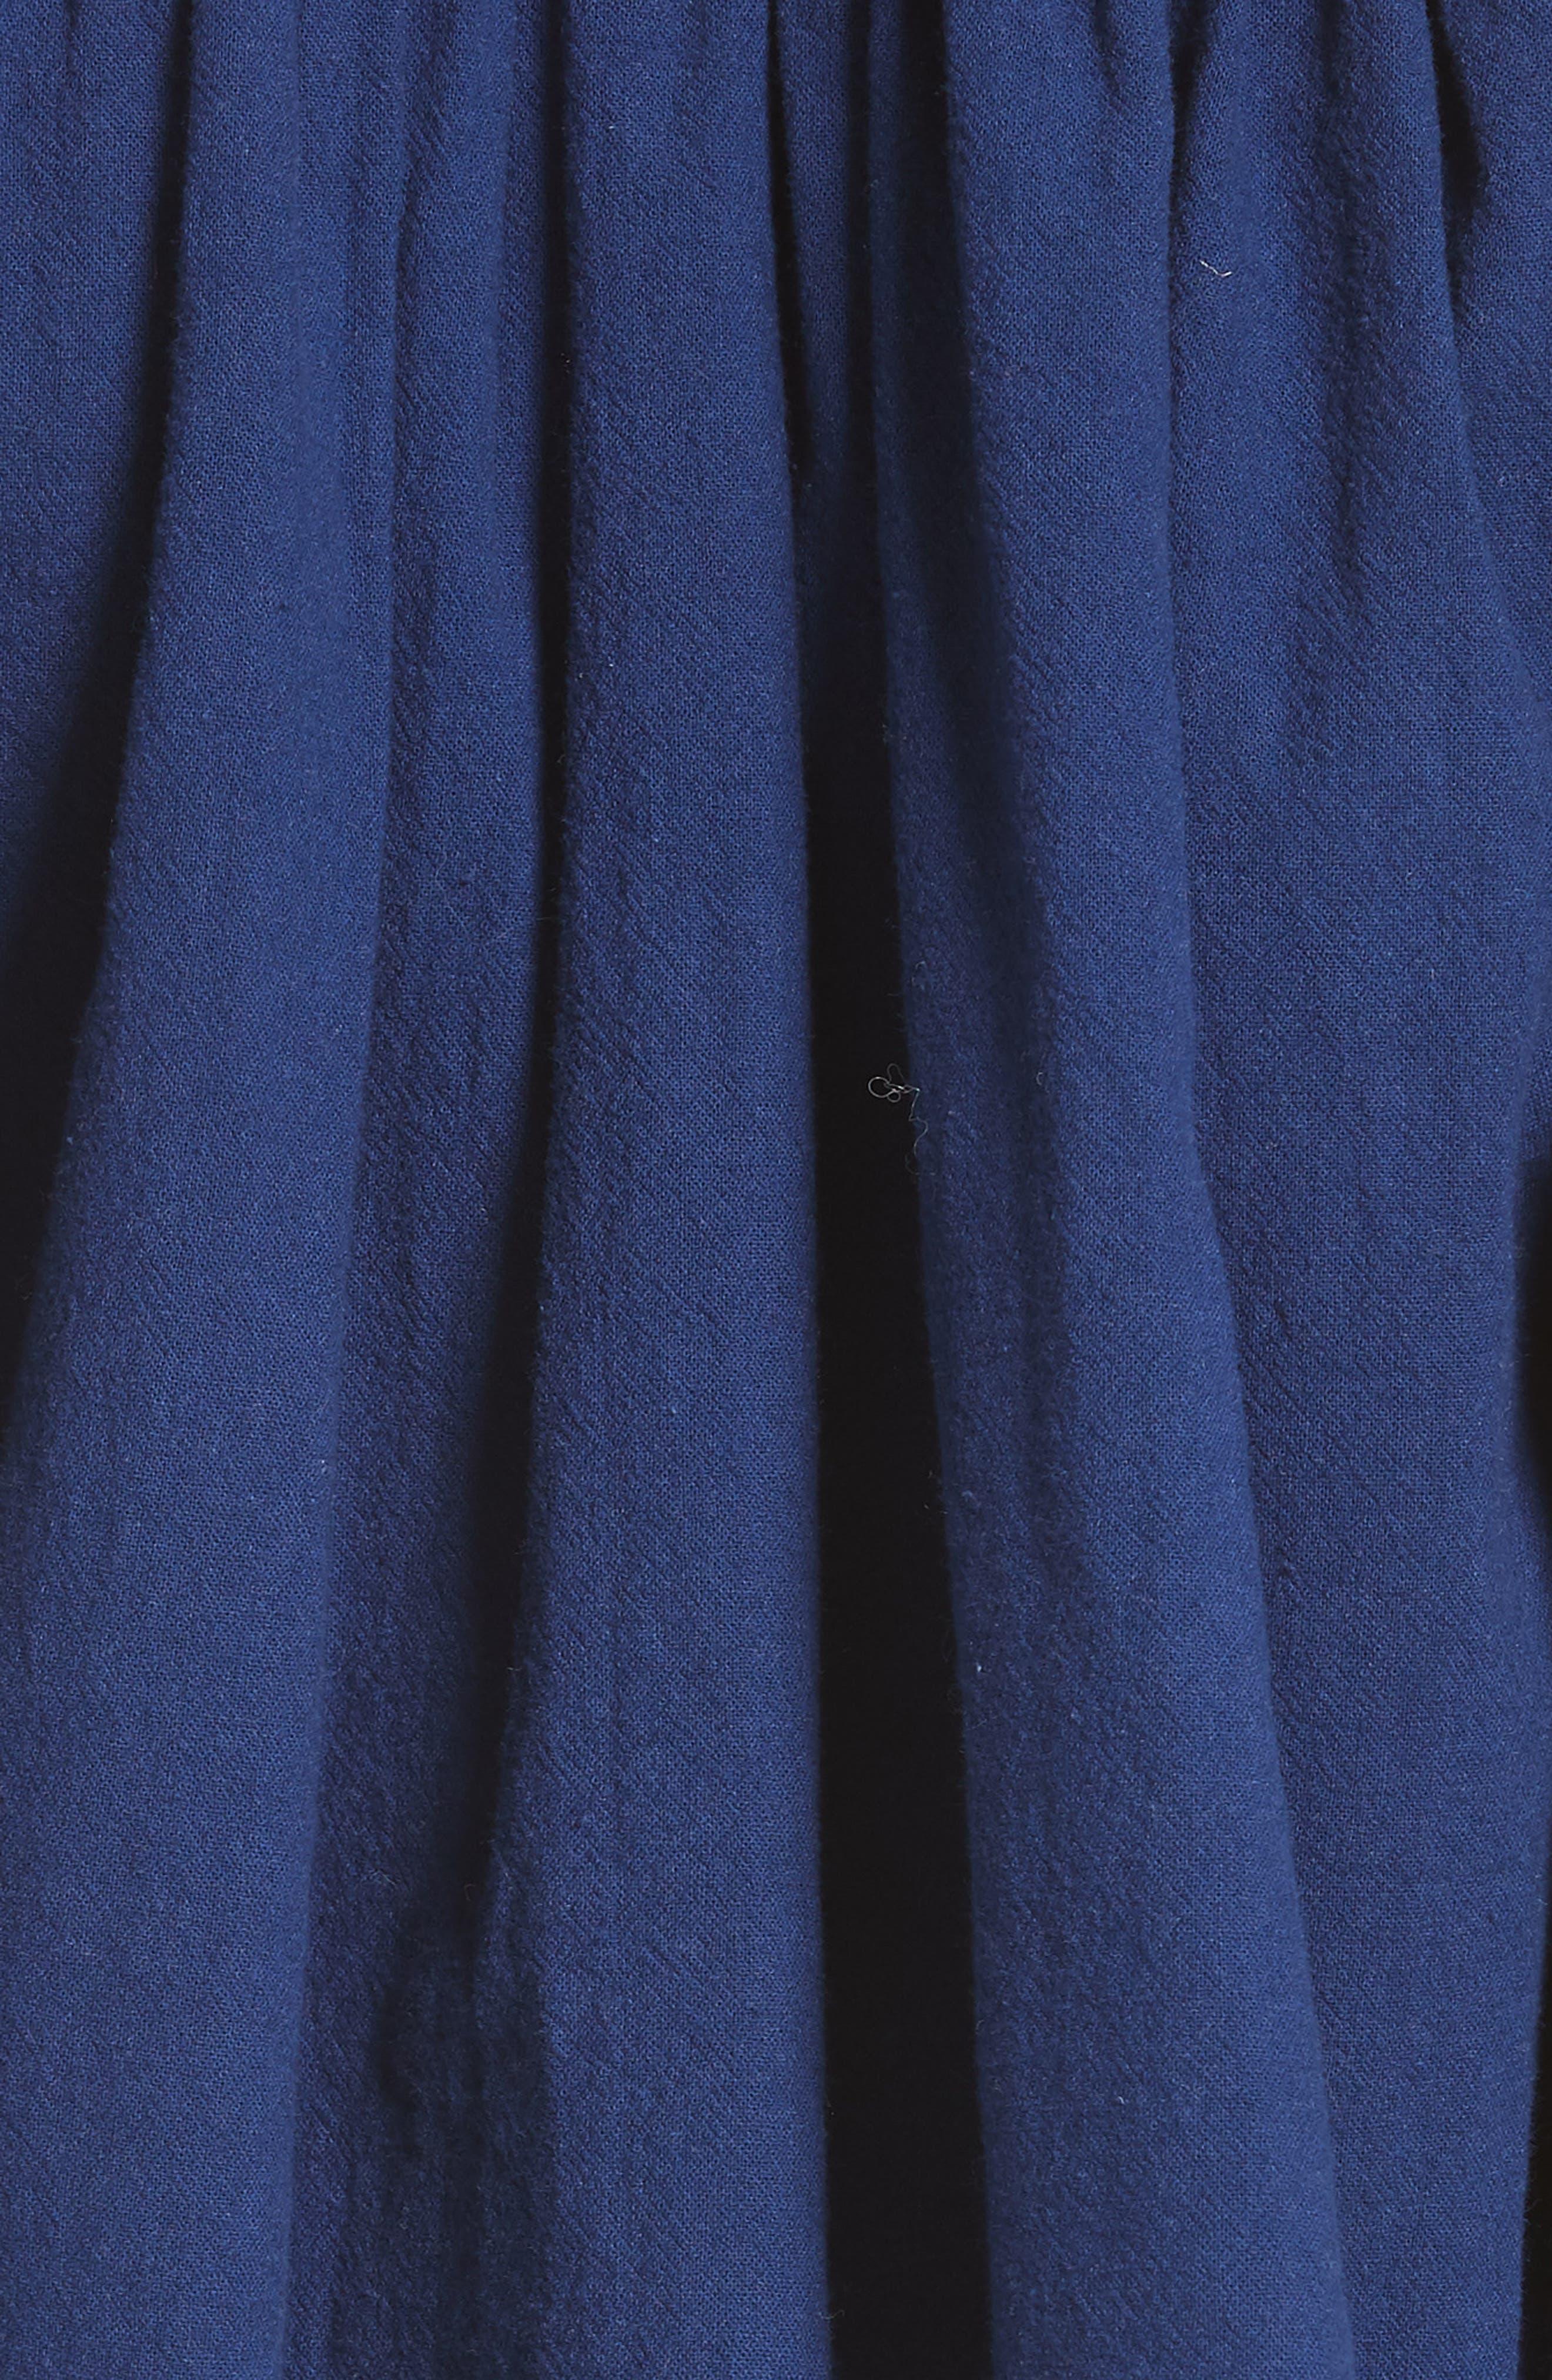 Cherry Bomb Top & Shorts,                             Alternate thumbnail 5, color,                             Blue